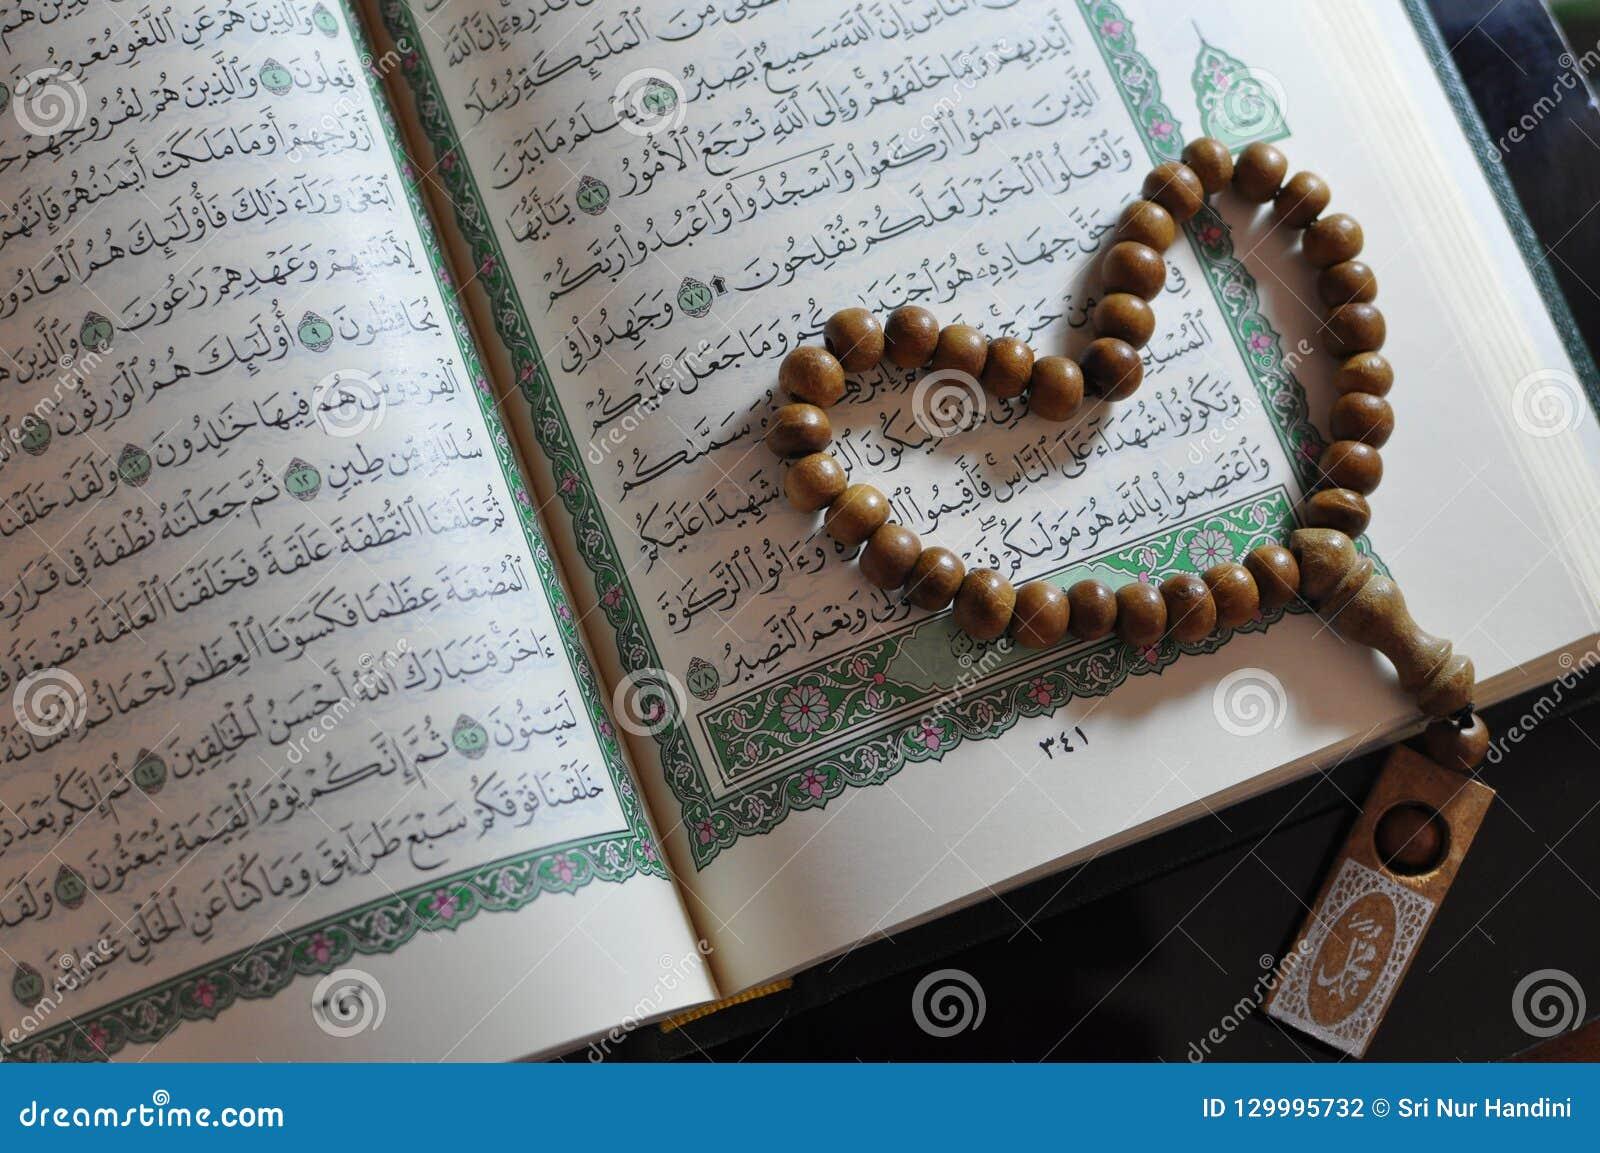 holy quran tasbih rosary beads holy quran tasbih rosary beads blur background 129995732